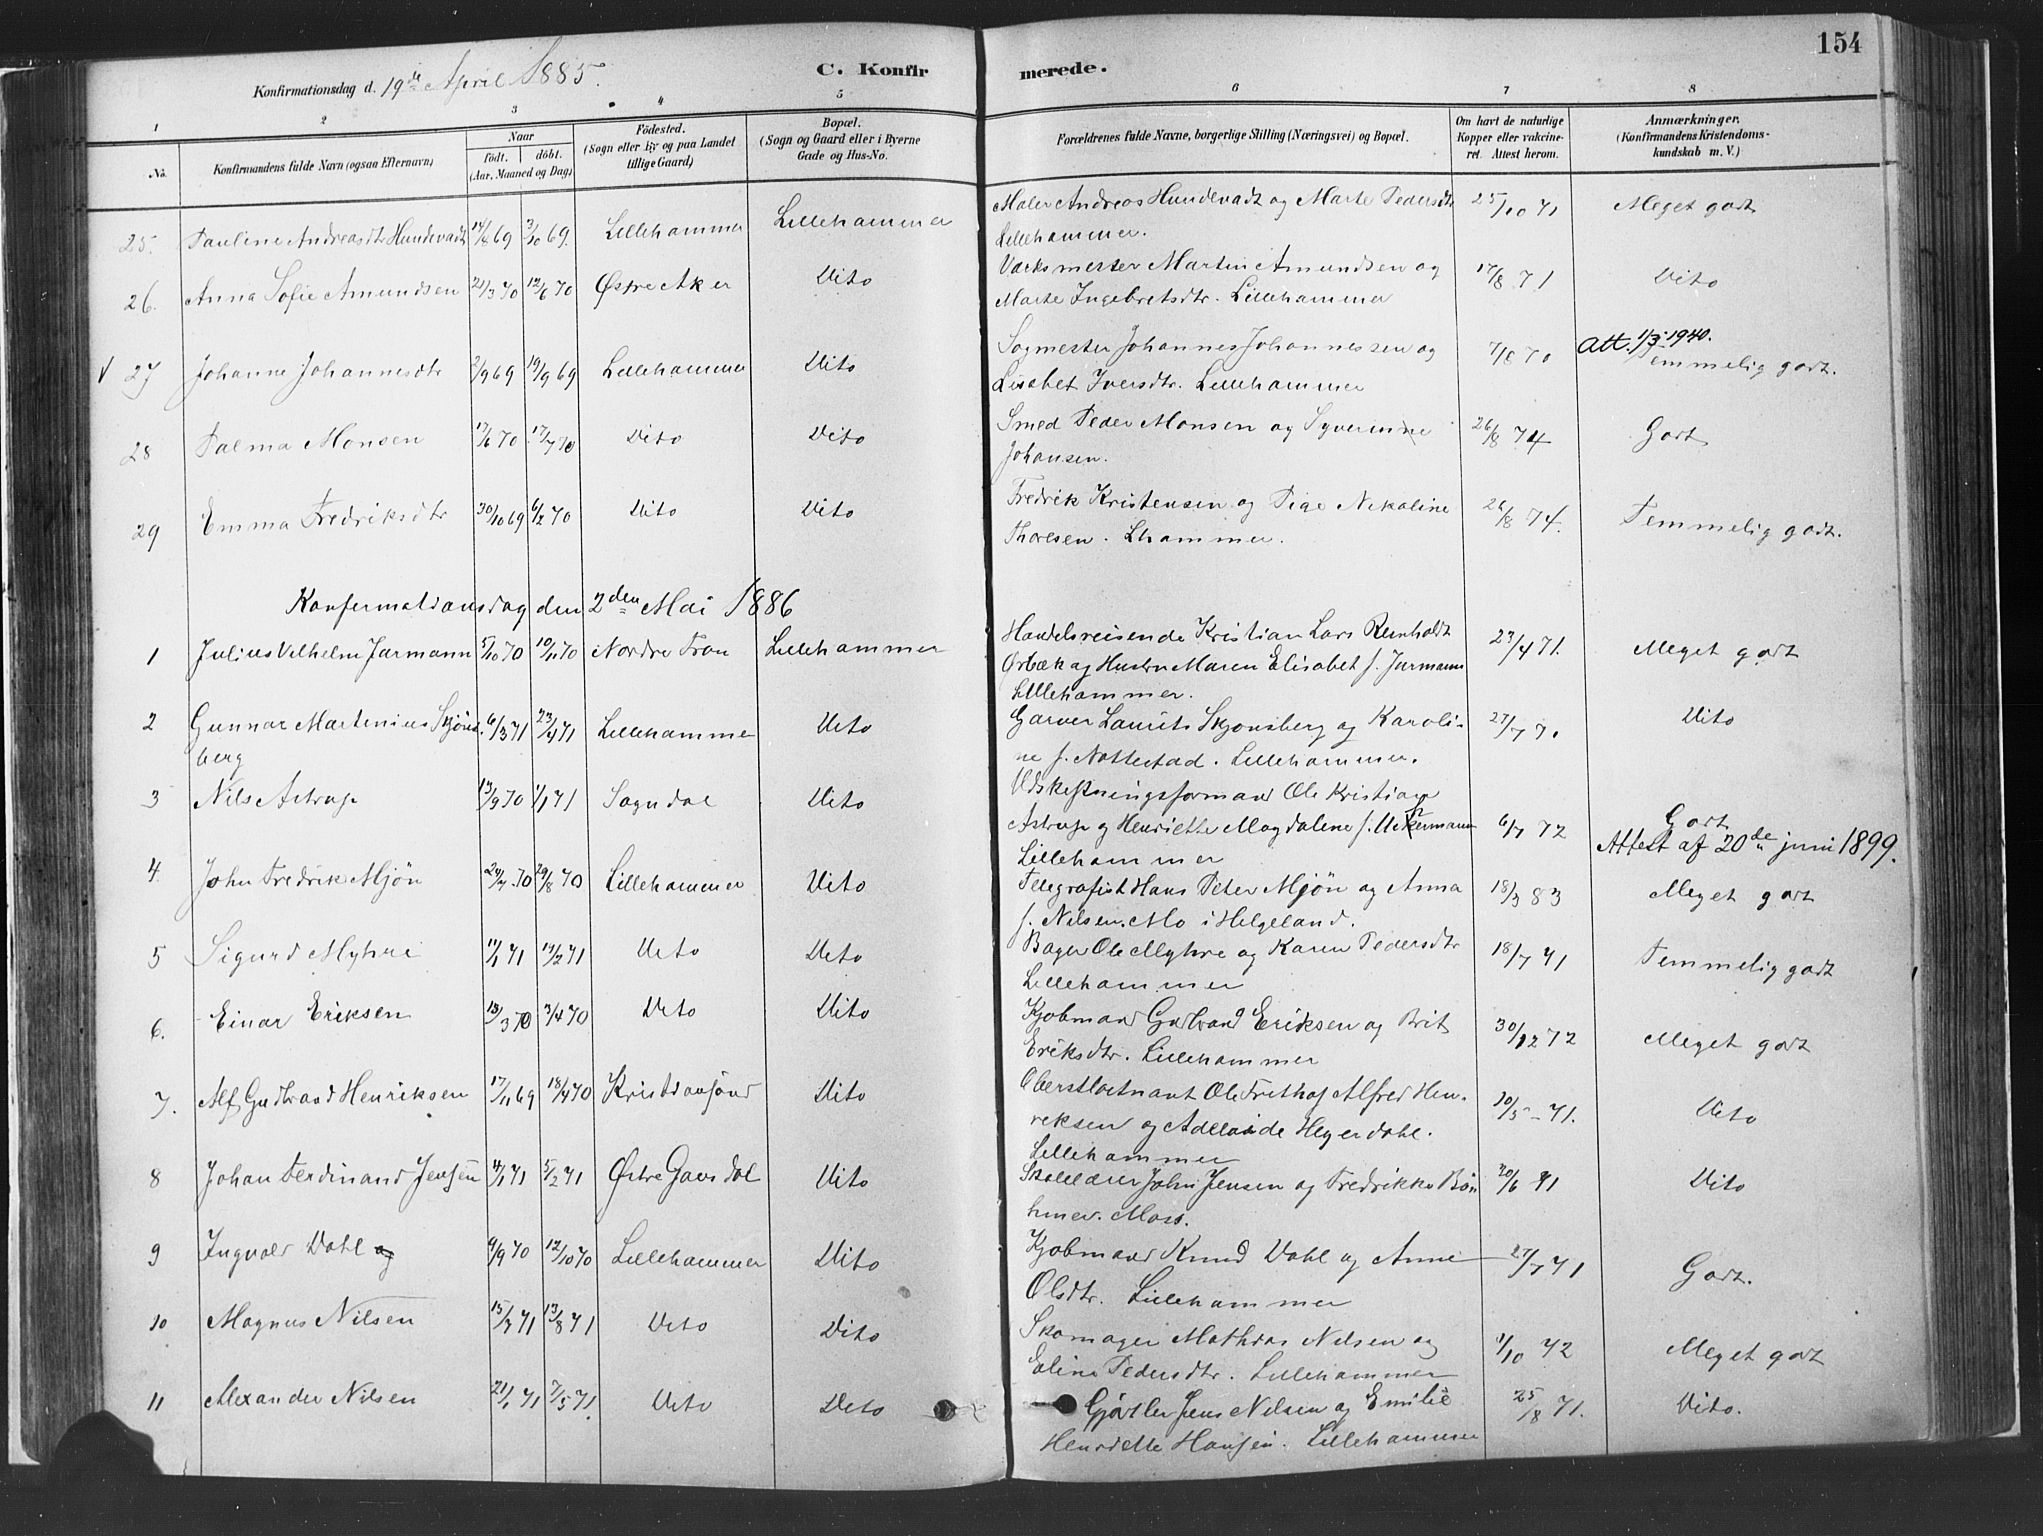 SAH, Fåberg prestekontor, H/Ha/Haa/L0010: Parish register (official) no. 10, 1879-1900, p. 154